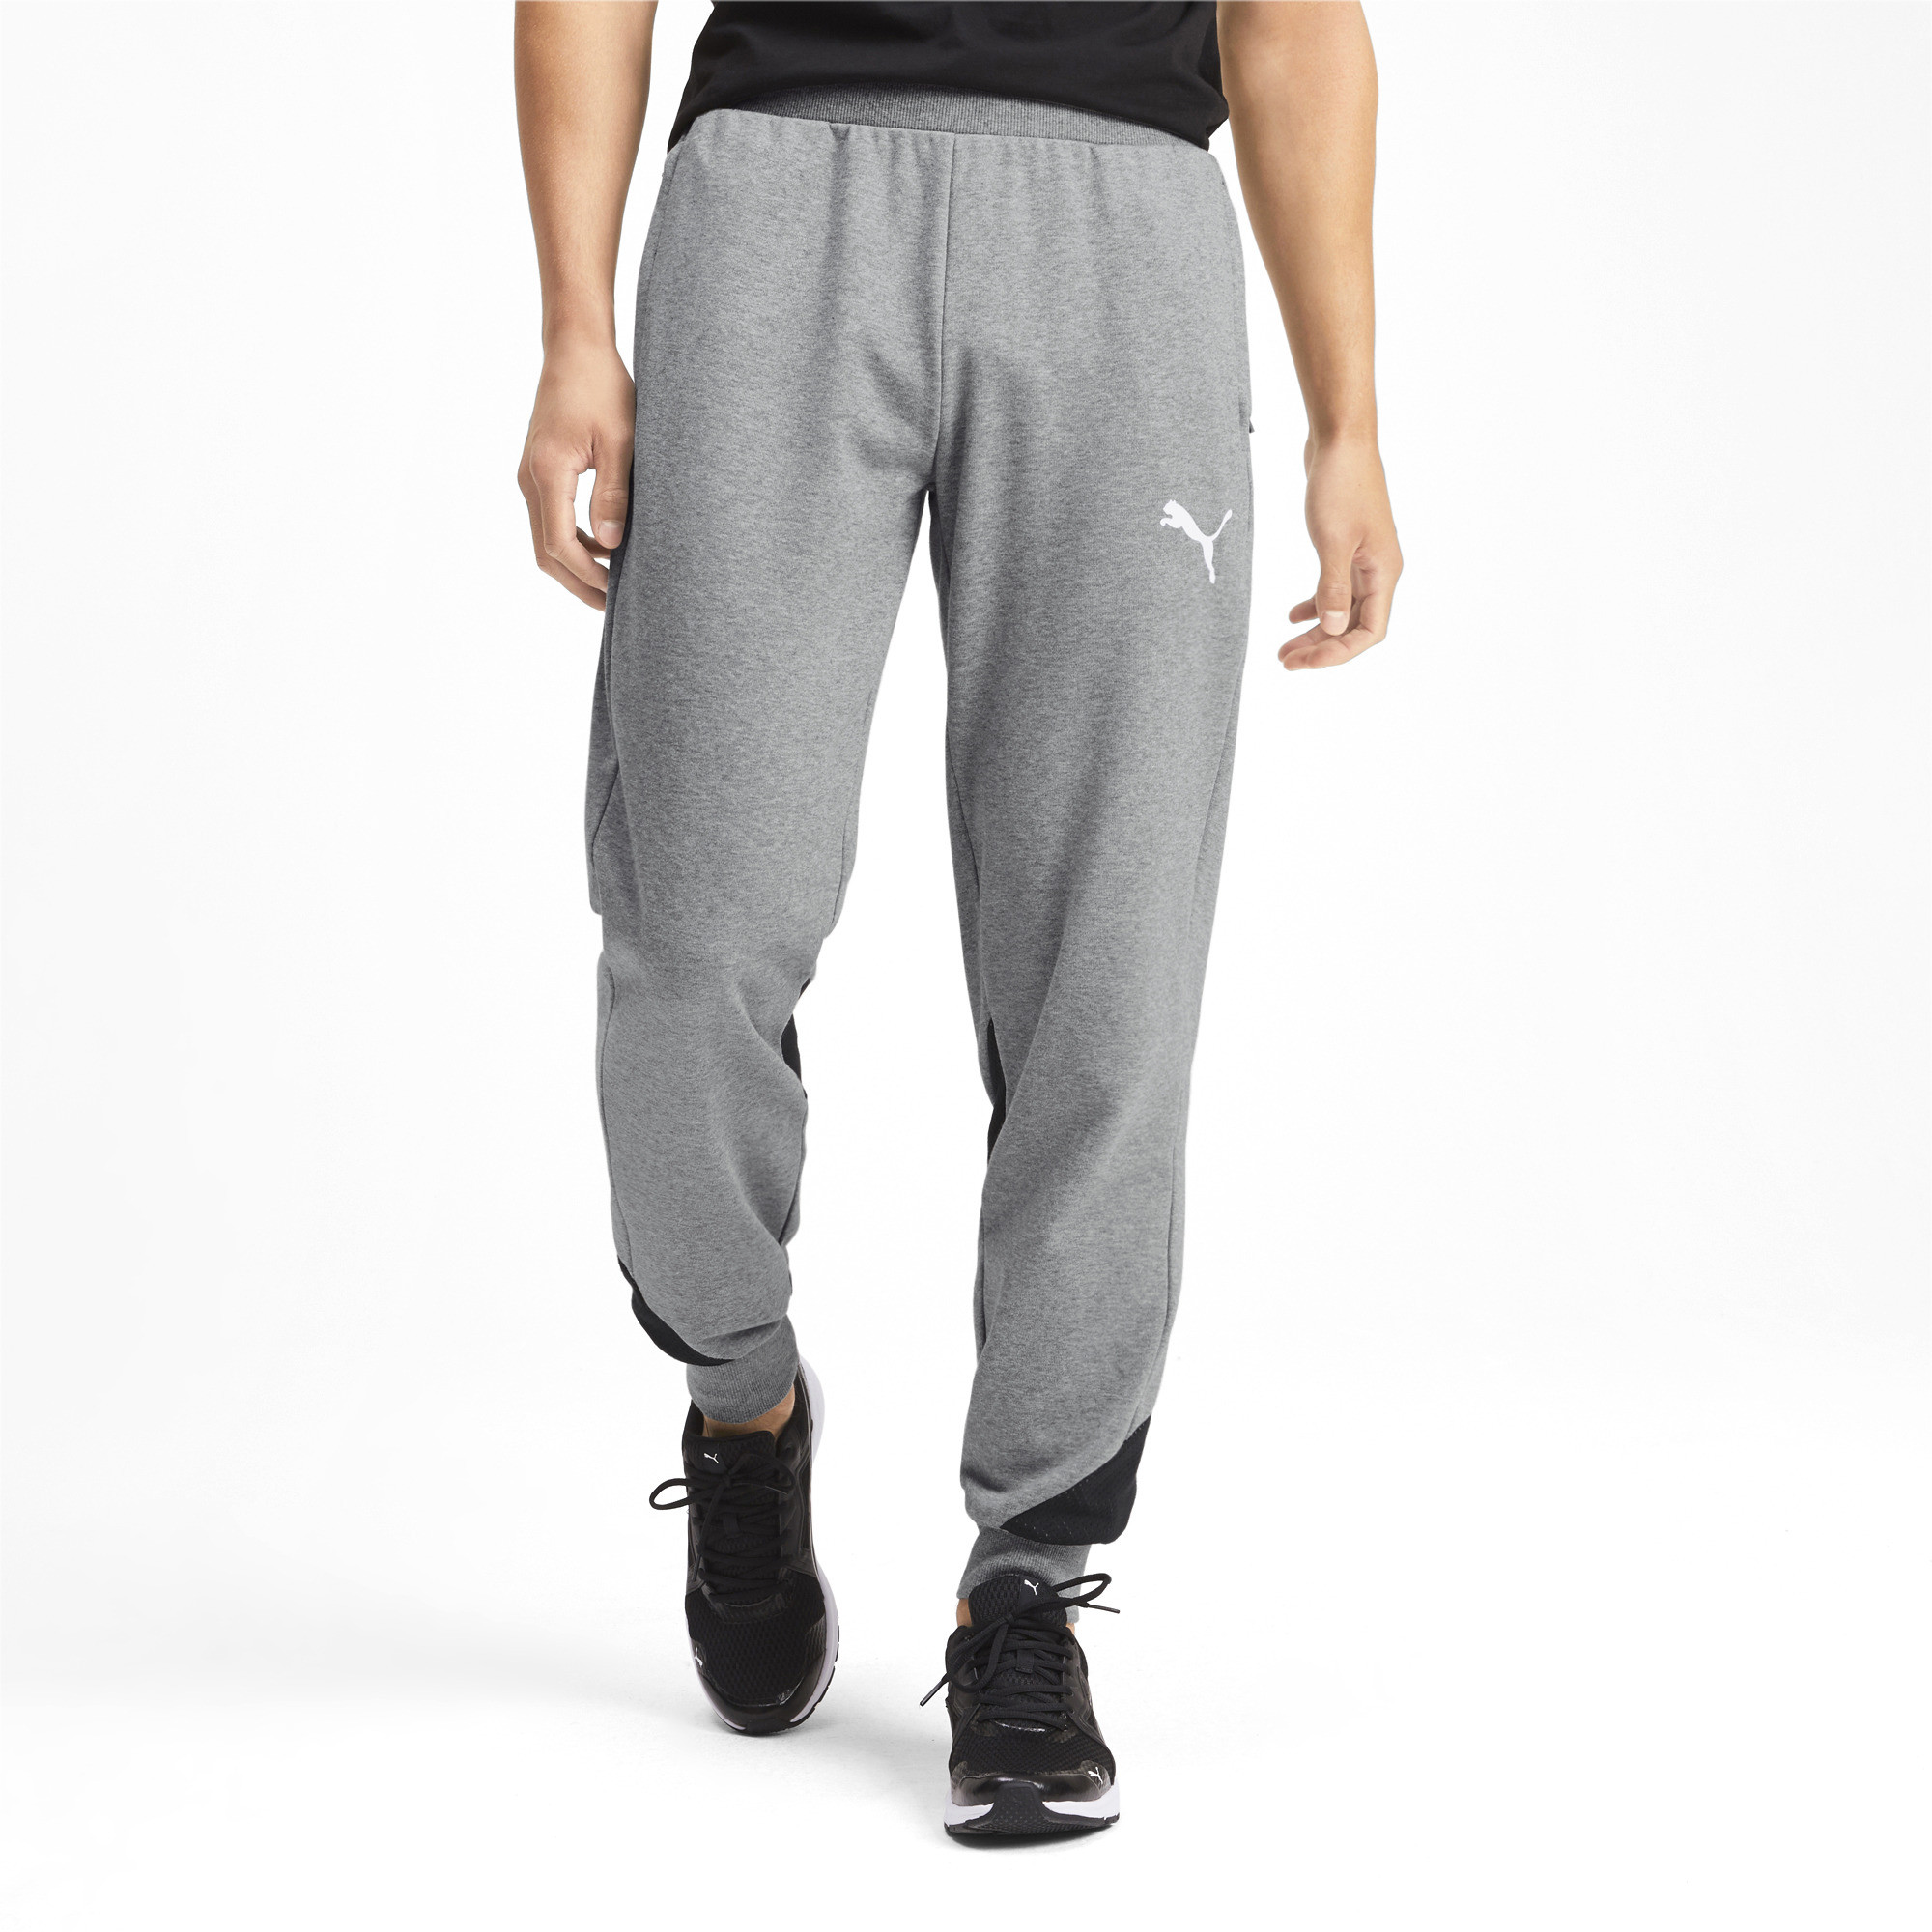 PUMA-Modern-Sports-Men-039-s-Sweatpants-Men-Knitted-Pants-Basics thumbnail 4